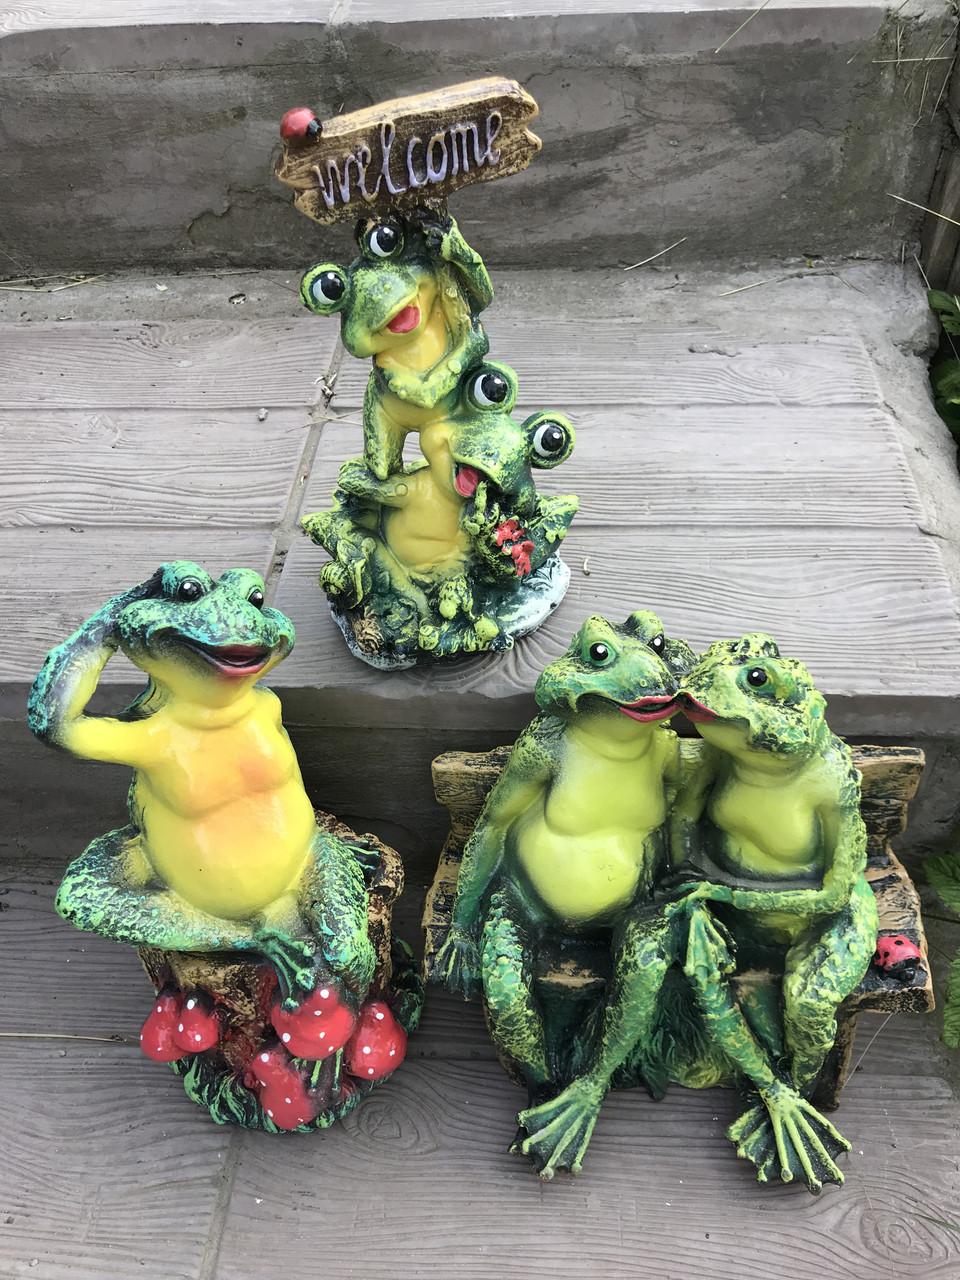 Комплект из 3 шт садовых фигур Лягушки (32 см, 36 см, 30 см)